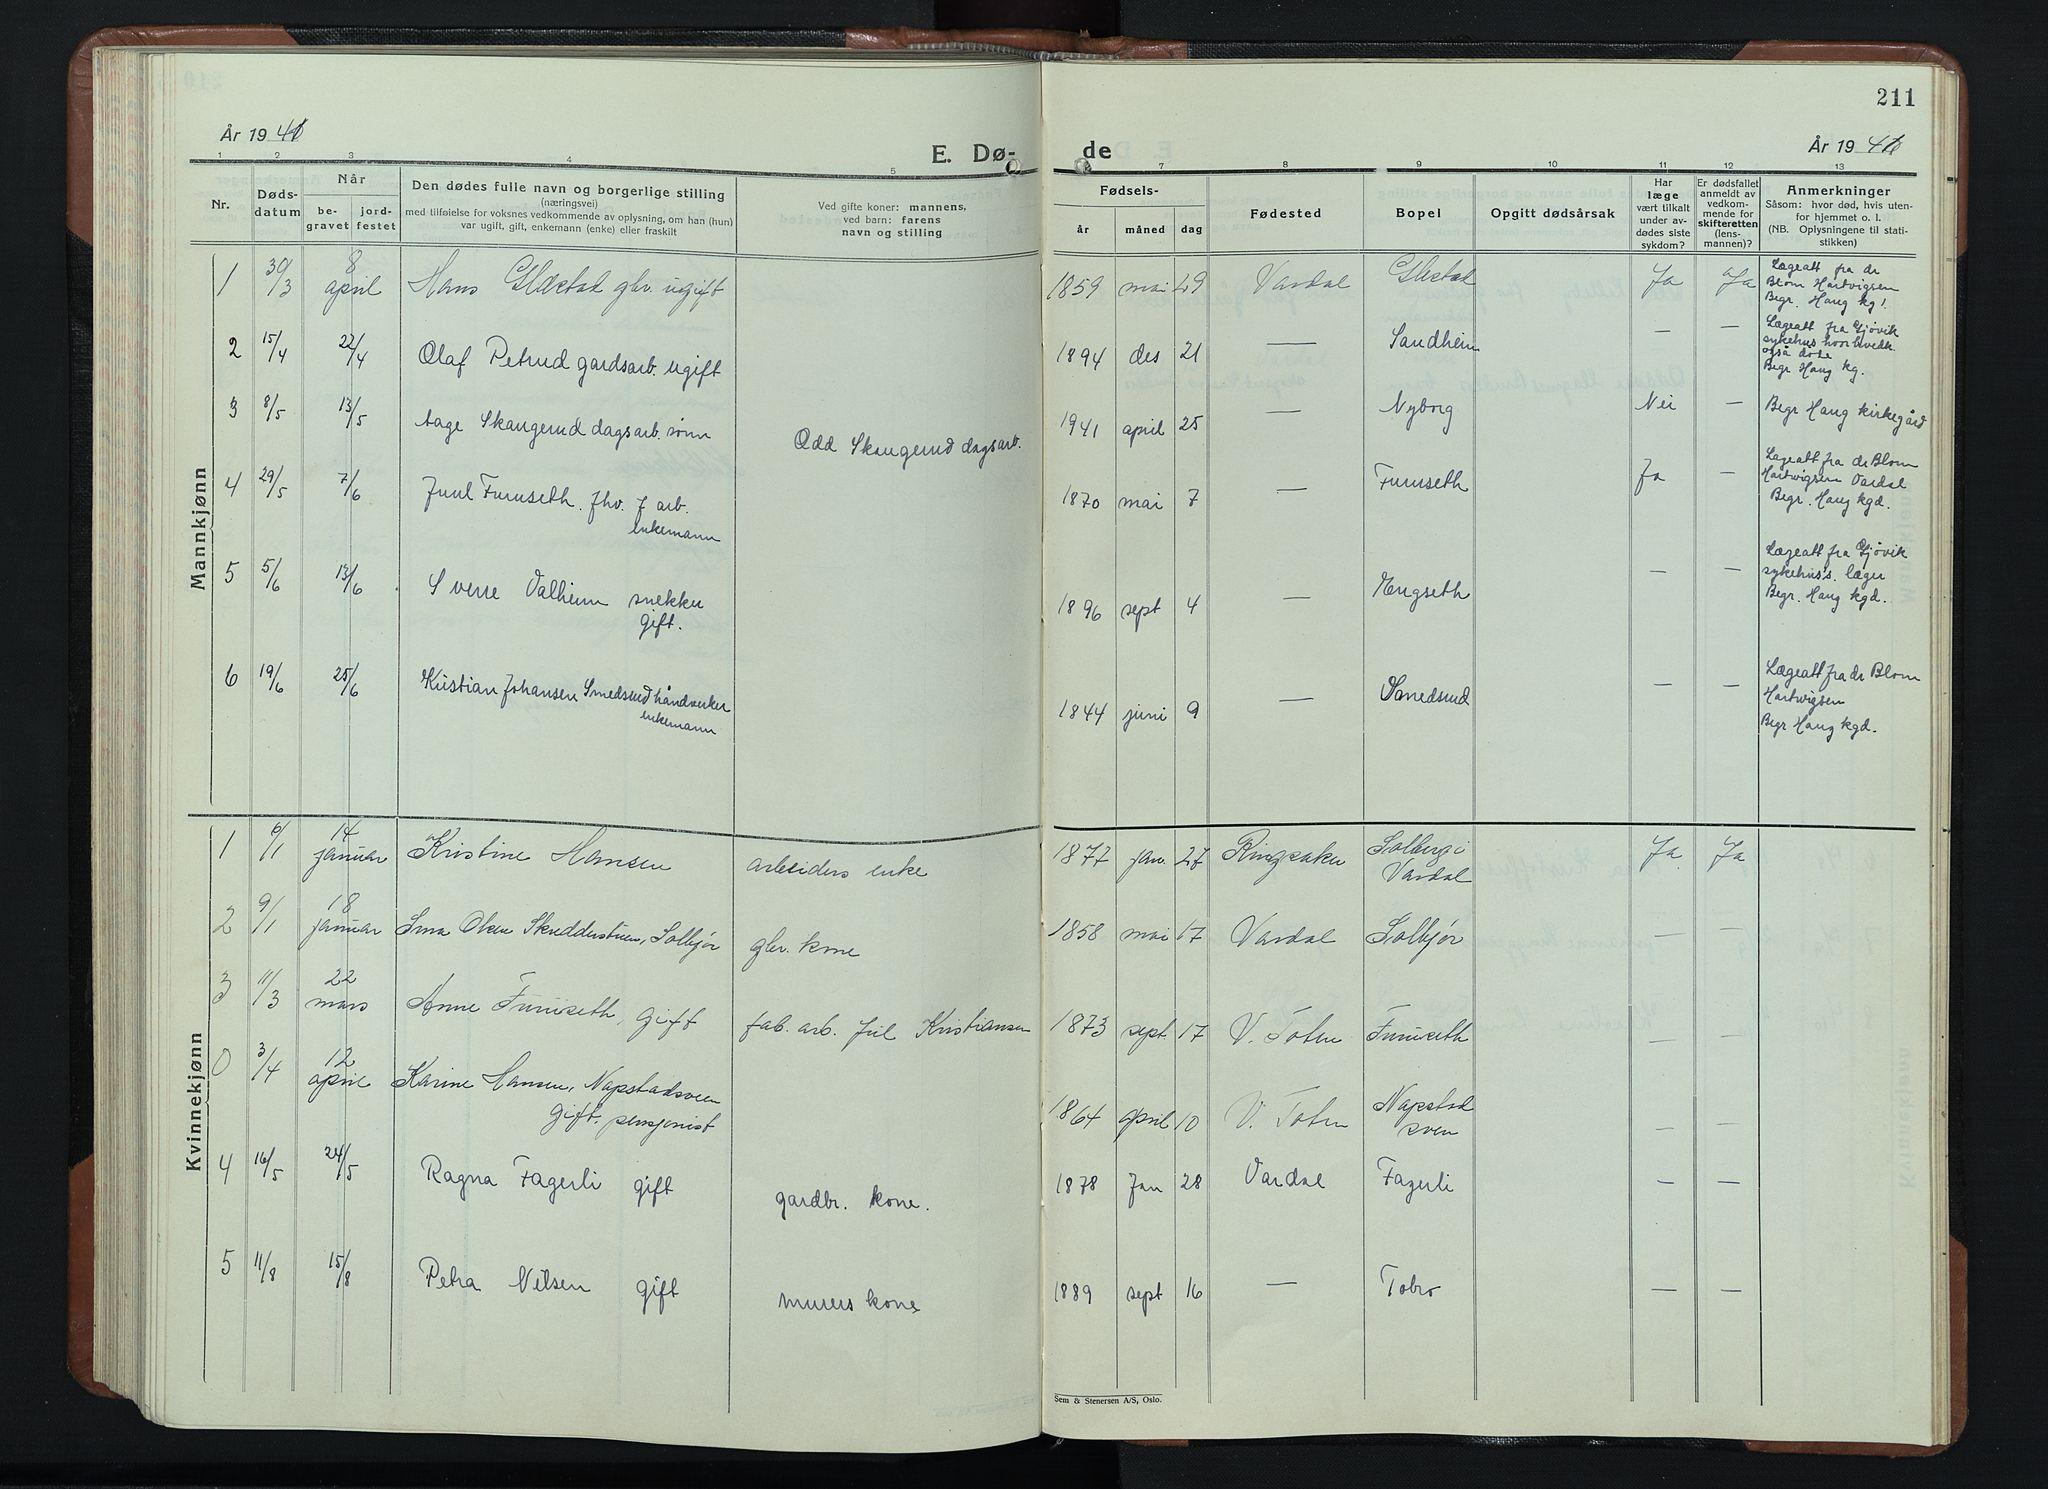 SAH, Vardal prestekontor, H/Ha/Hab/L0018: Klokkerbok nr. 18, 1931-1951, s. 211